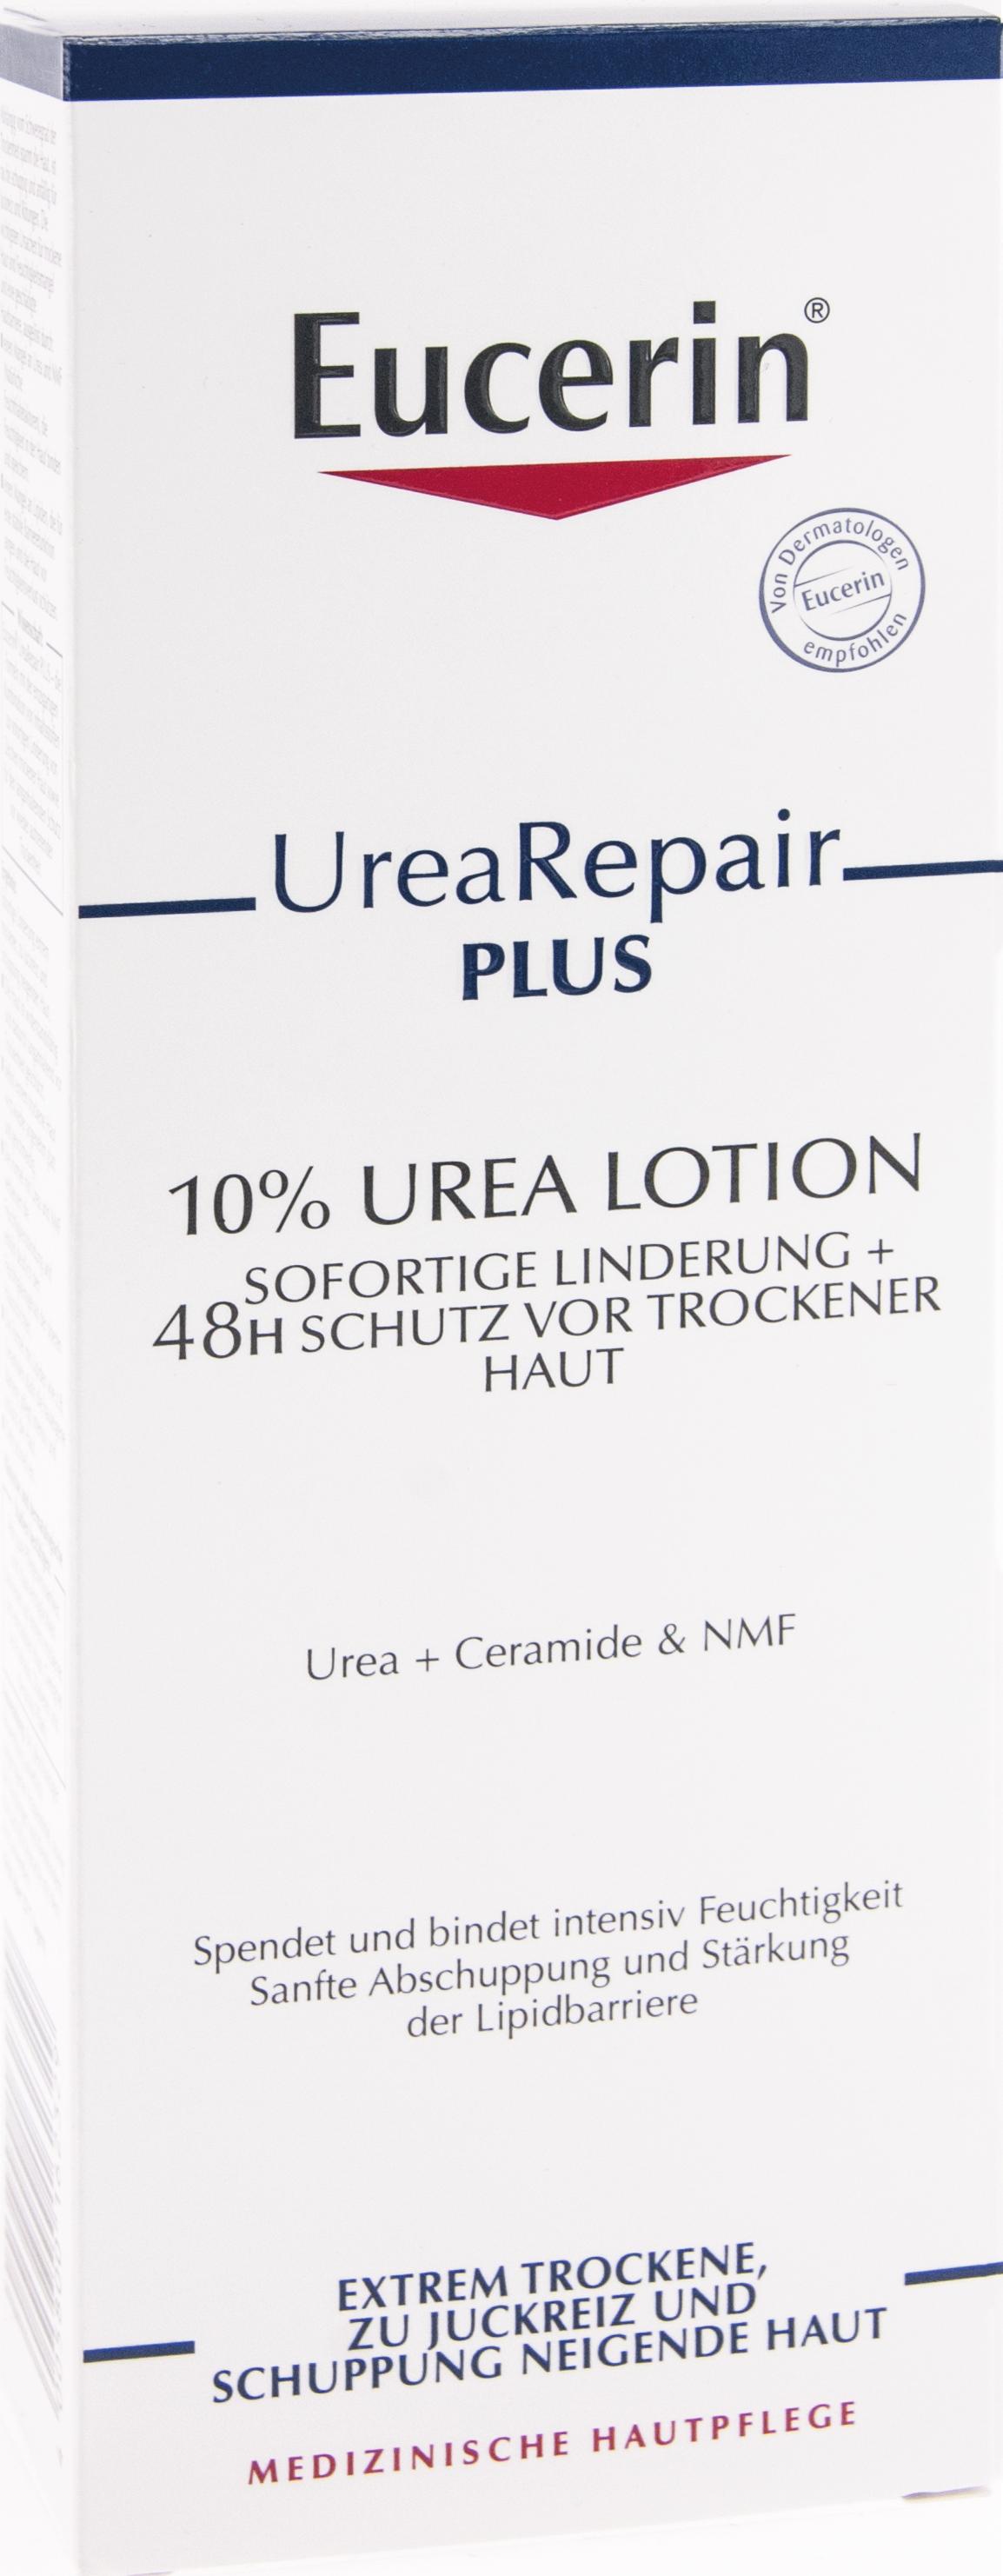 Eucerin UreaRepair PLUS Lotion 10%